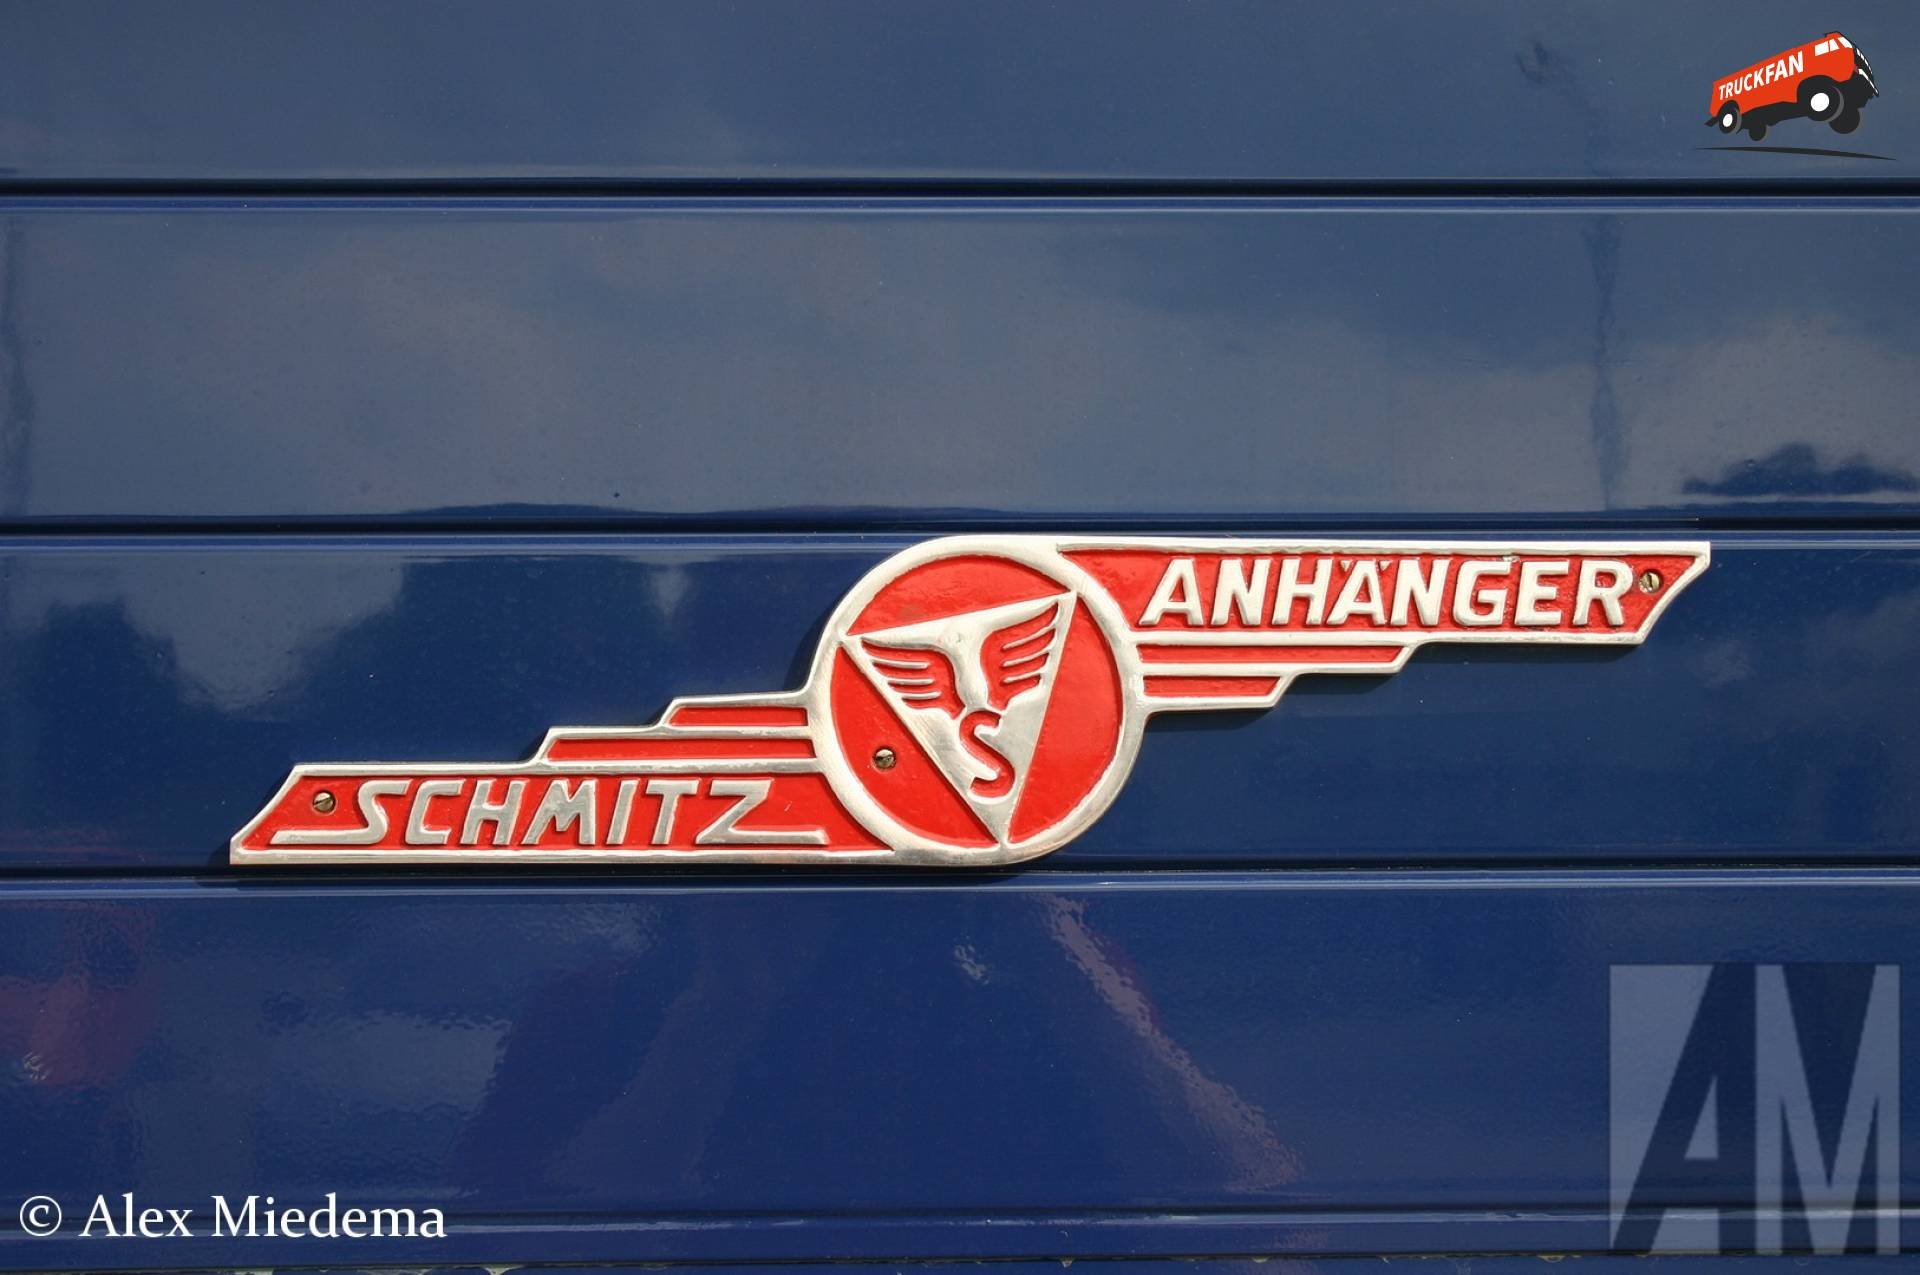 Schmitz logo